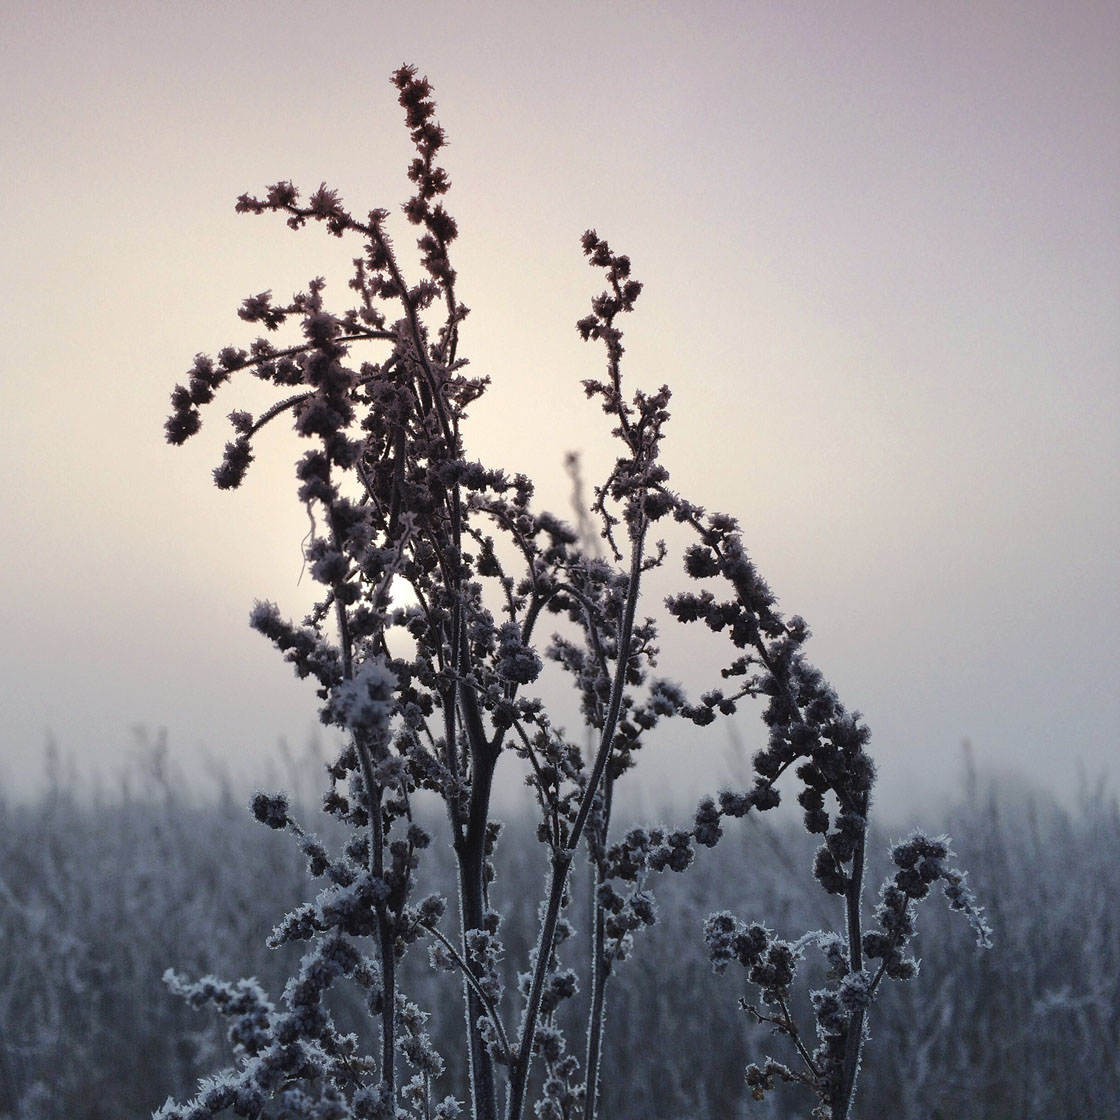 Fog & Mist iPhone Photos 12 no script